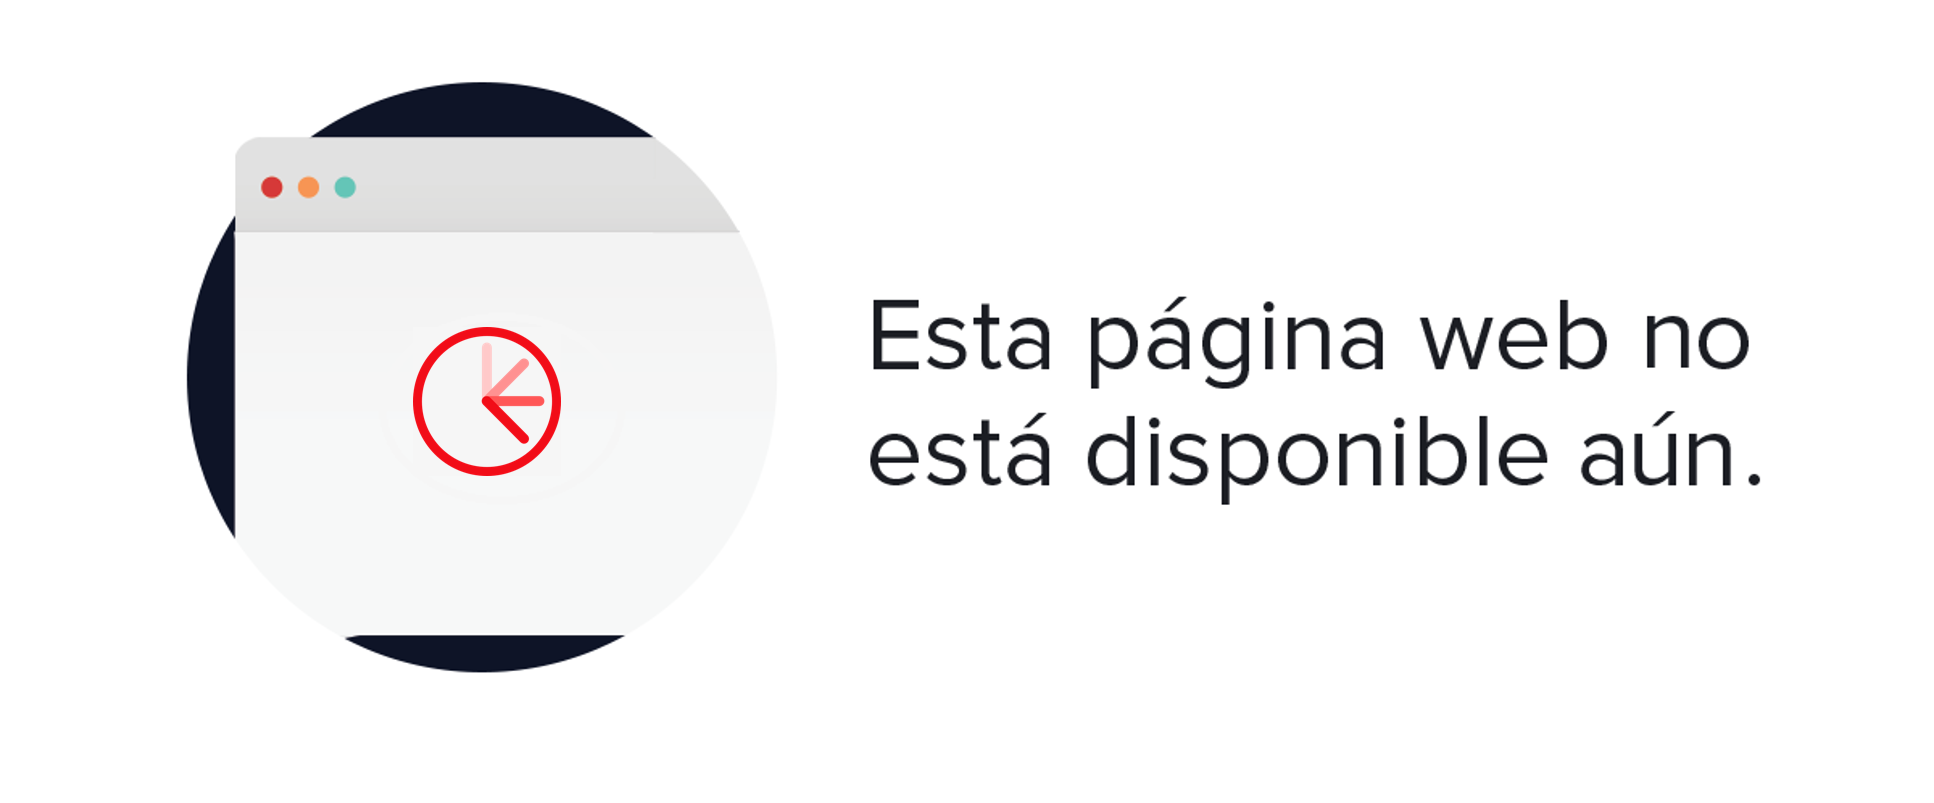 Bolsas de Papel Personalizadas con Asa Plana Medidas 32+22x32 cm 90gr